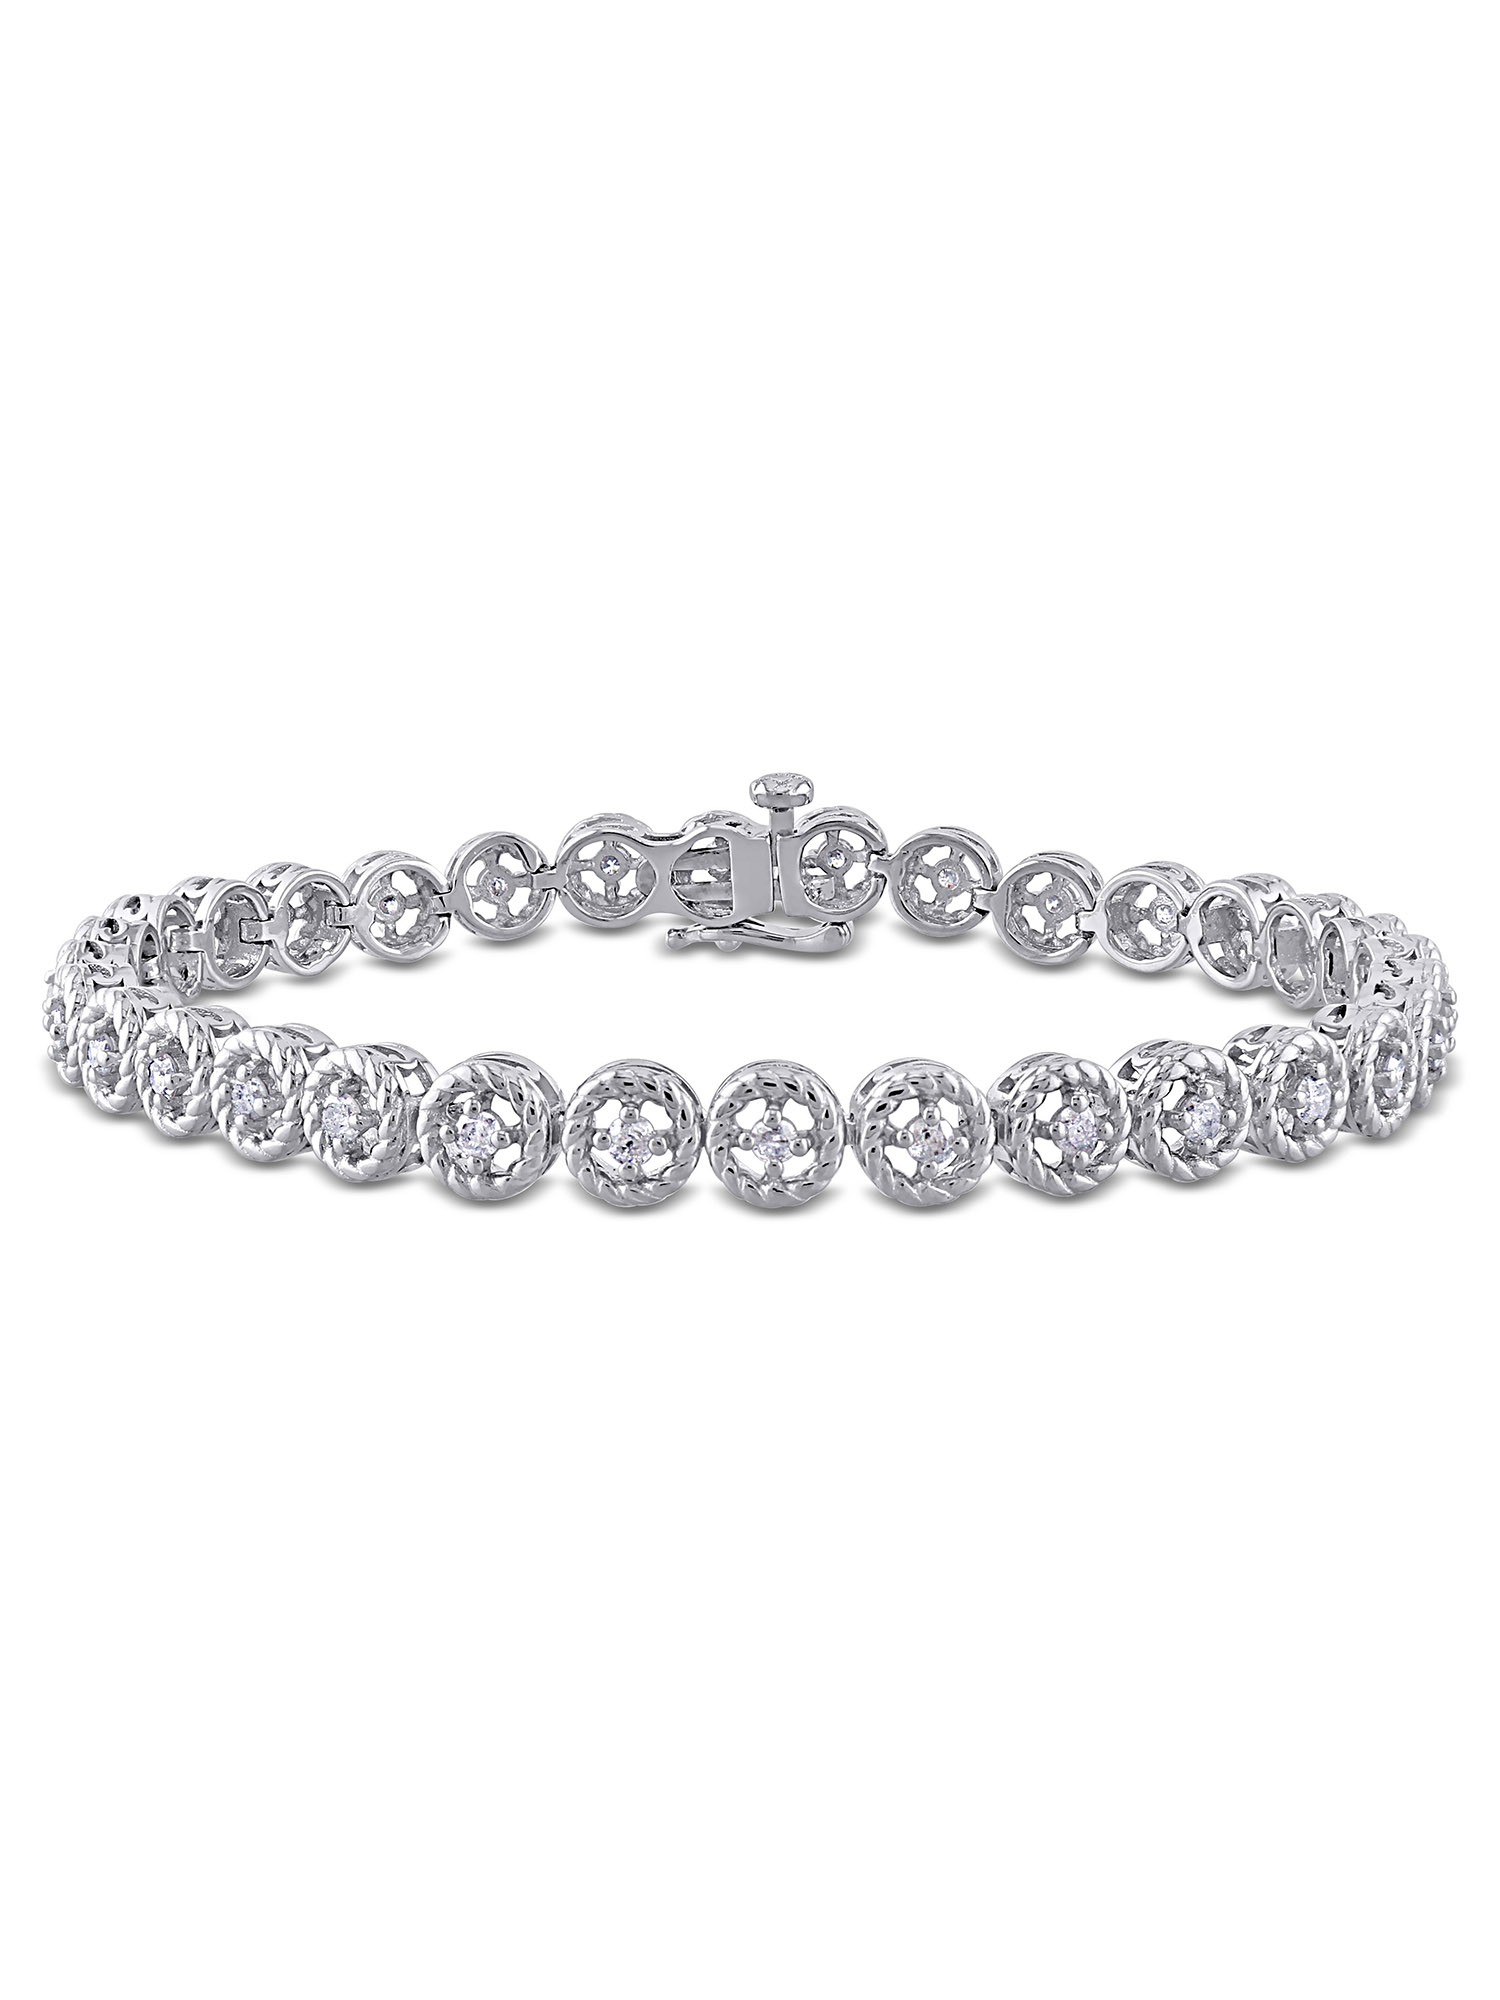 "Miabella 1 Cttw Diamond Sterling Silver Tennis Bracelet, 7"""